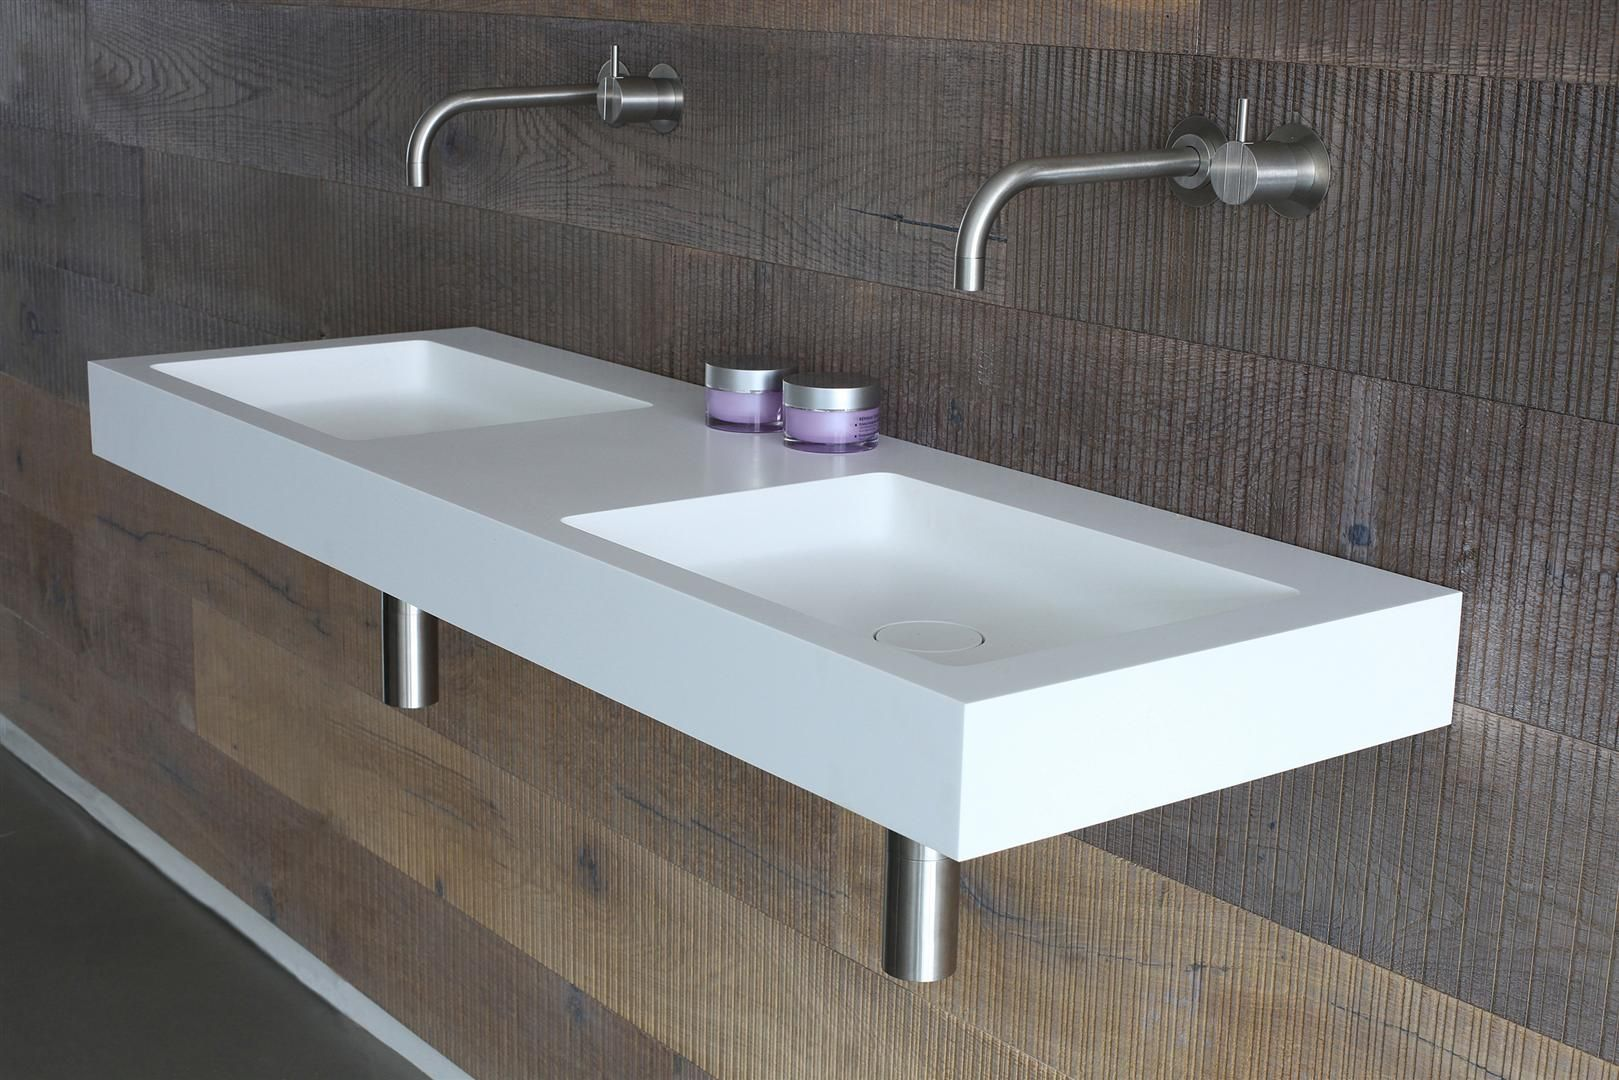 Wash basin. sjartec badkamers sanitair leiden zuid holland